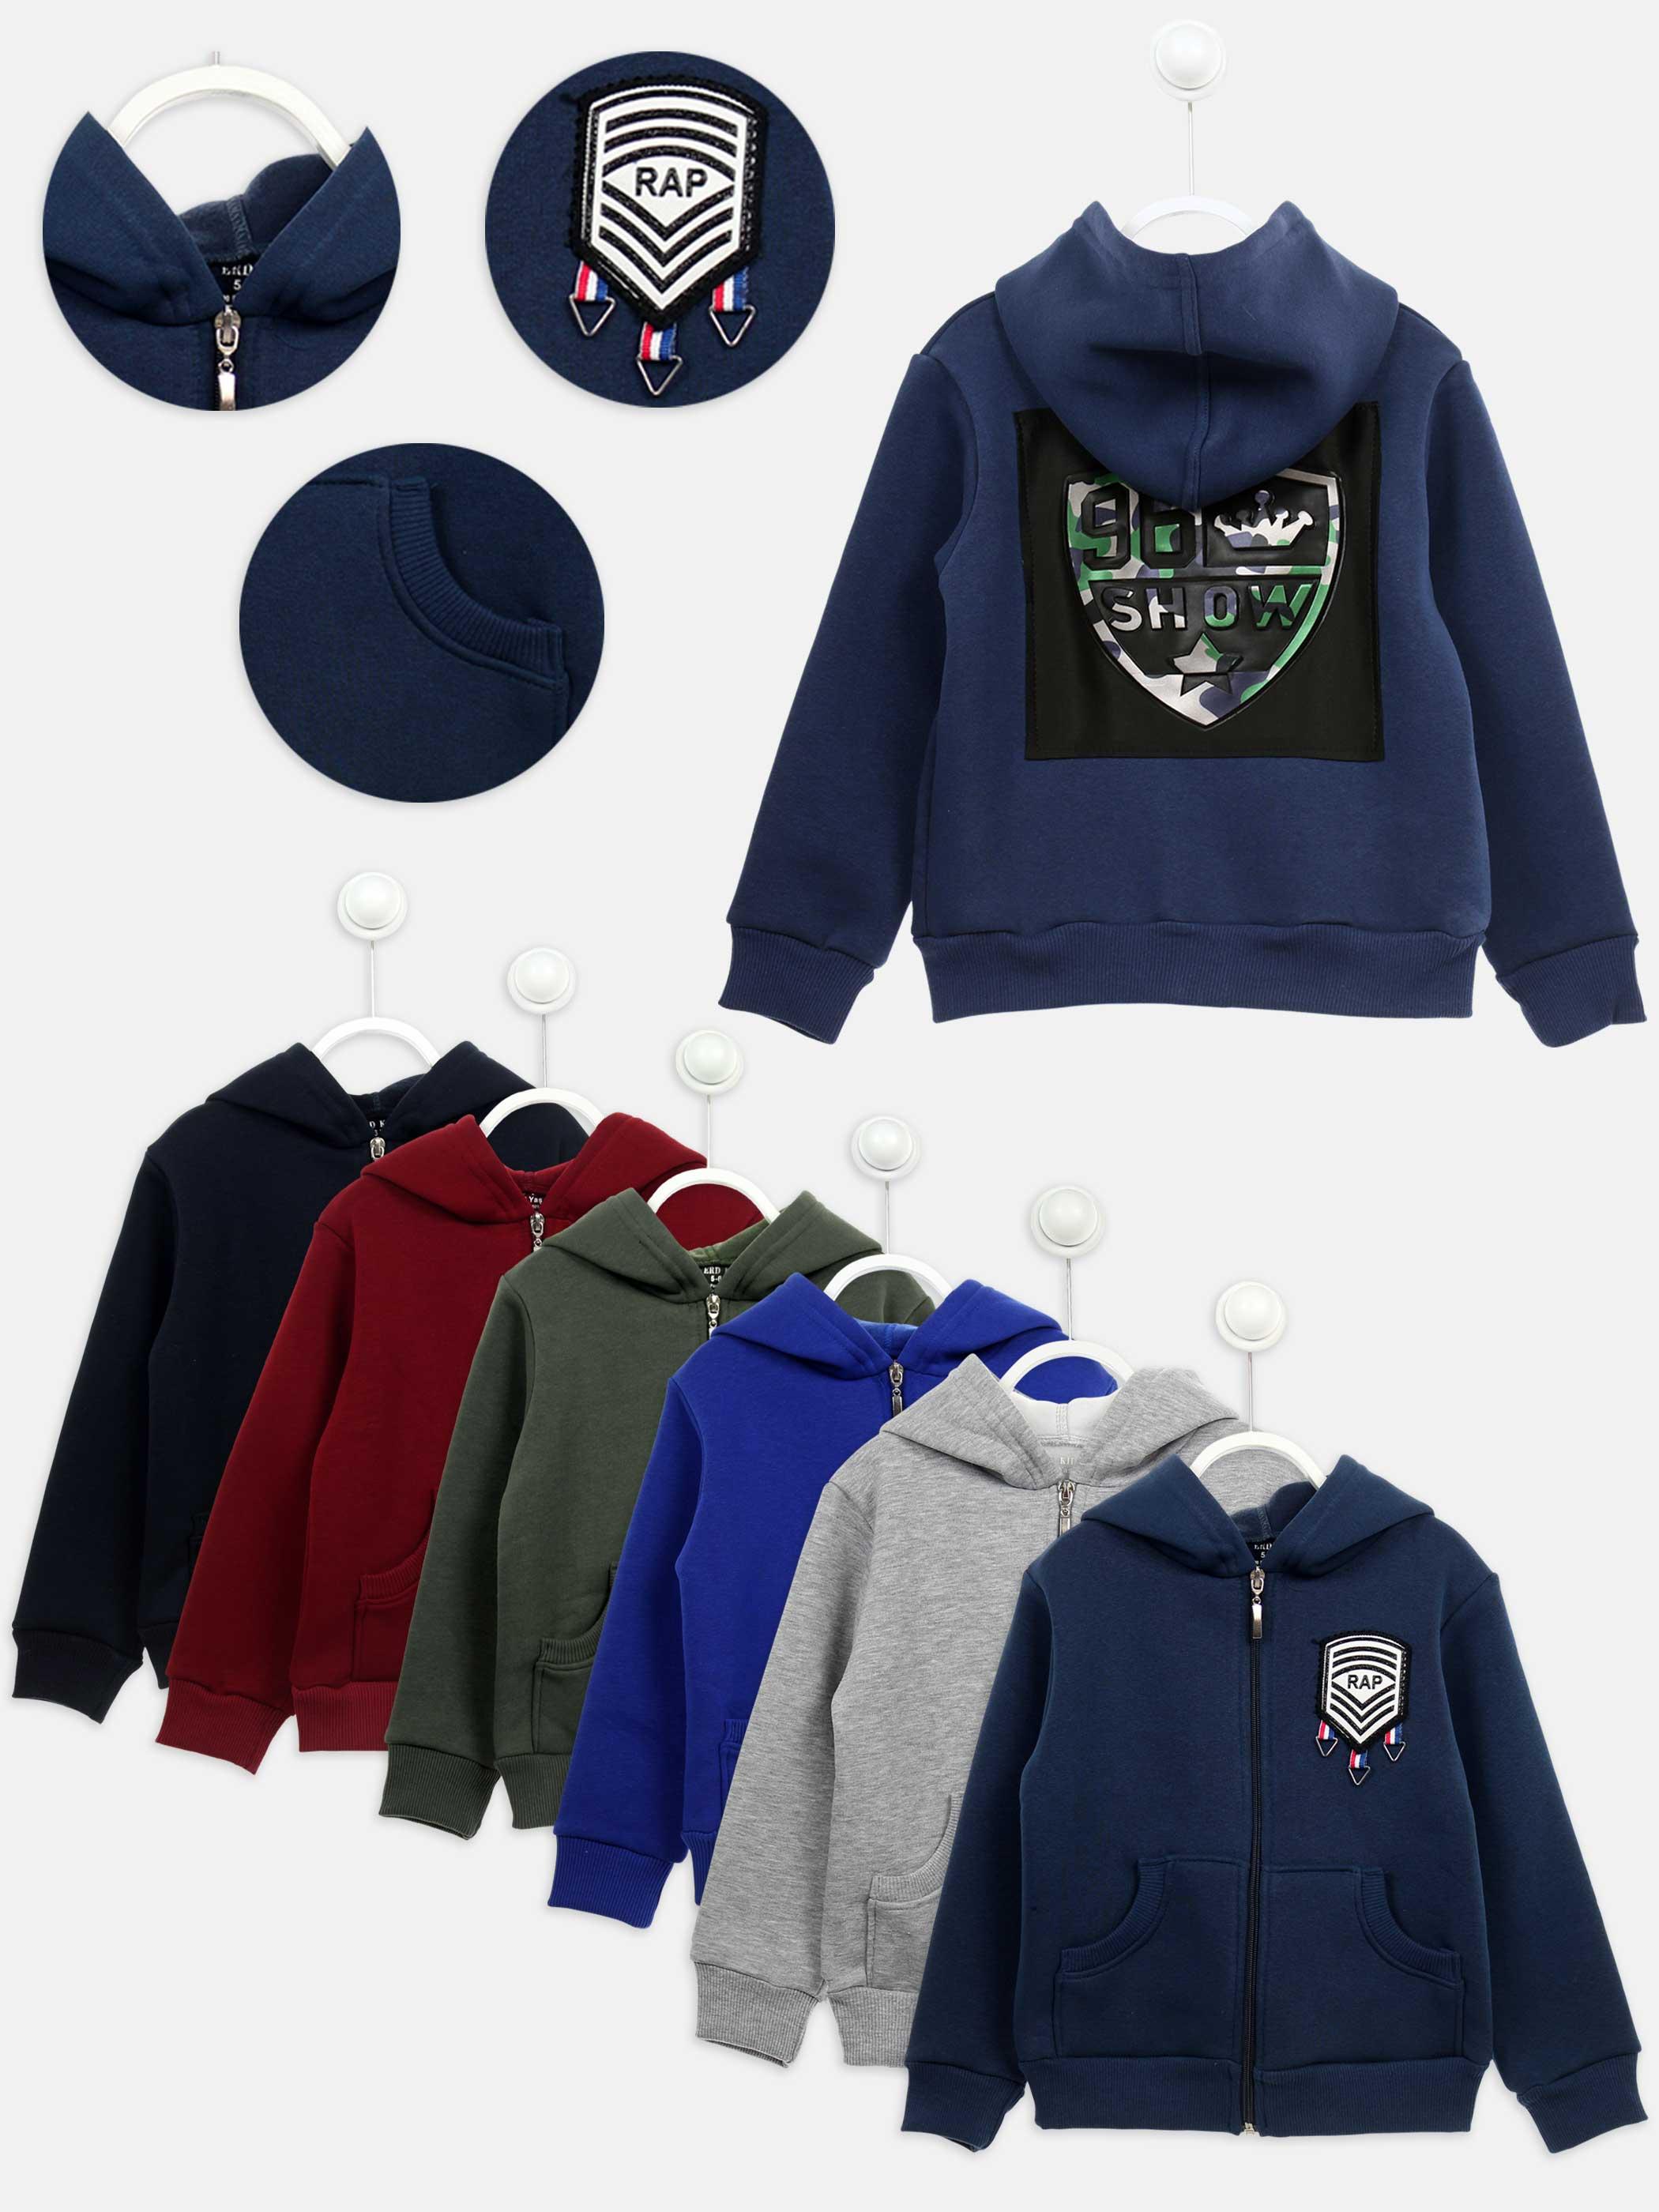 2020 New Spring Autumn Teenage Boy  Children Clothes Cotton Hooded Inside Fleece Sweatshirt Children Casual Sports Wear Models